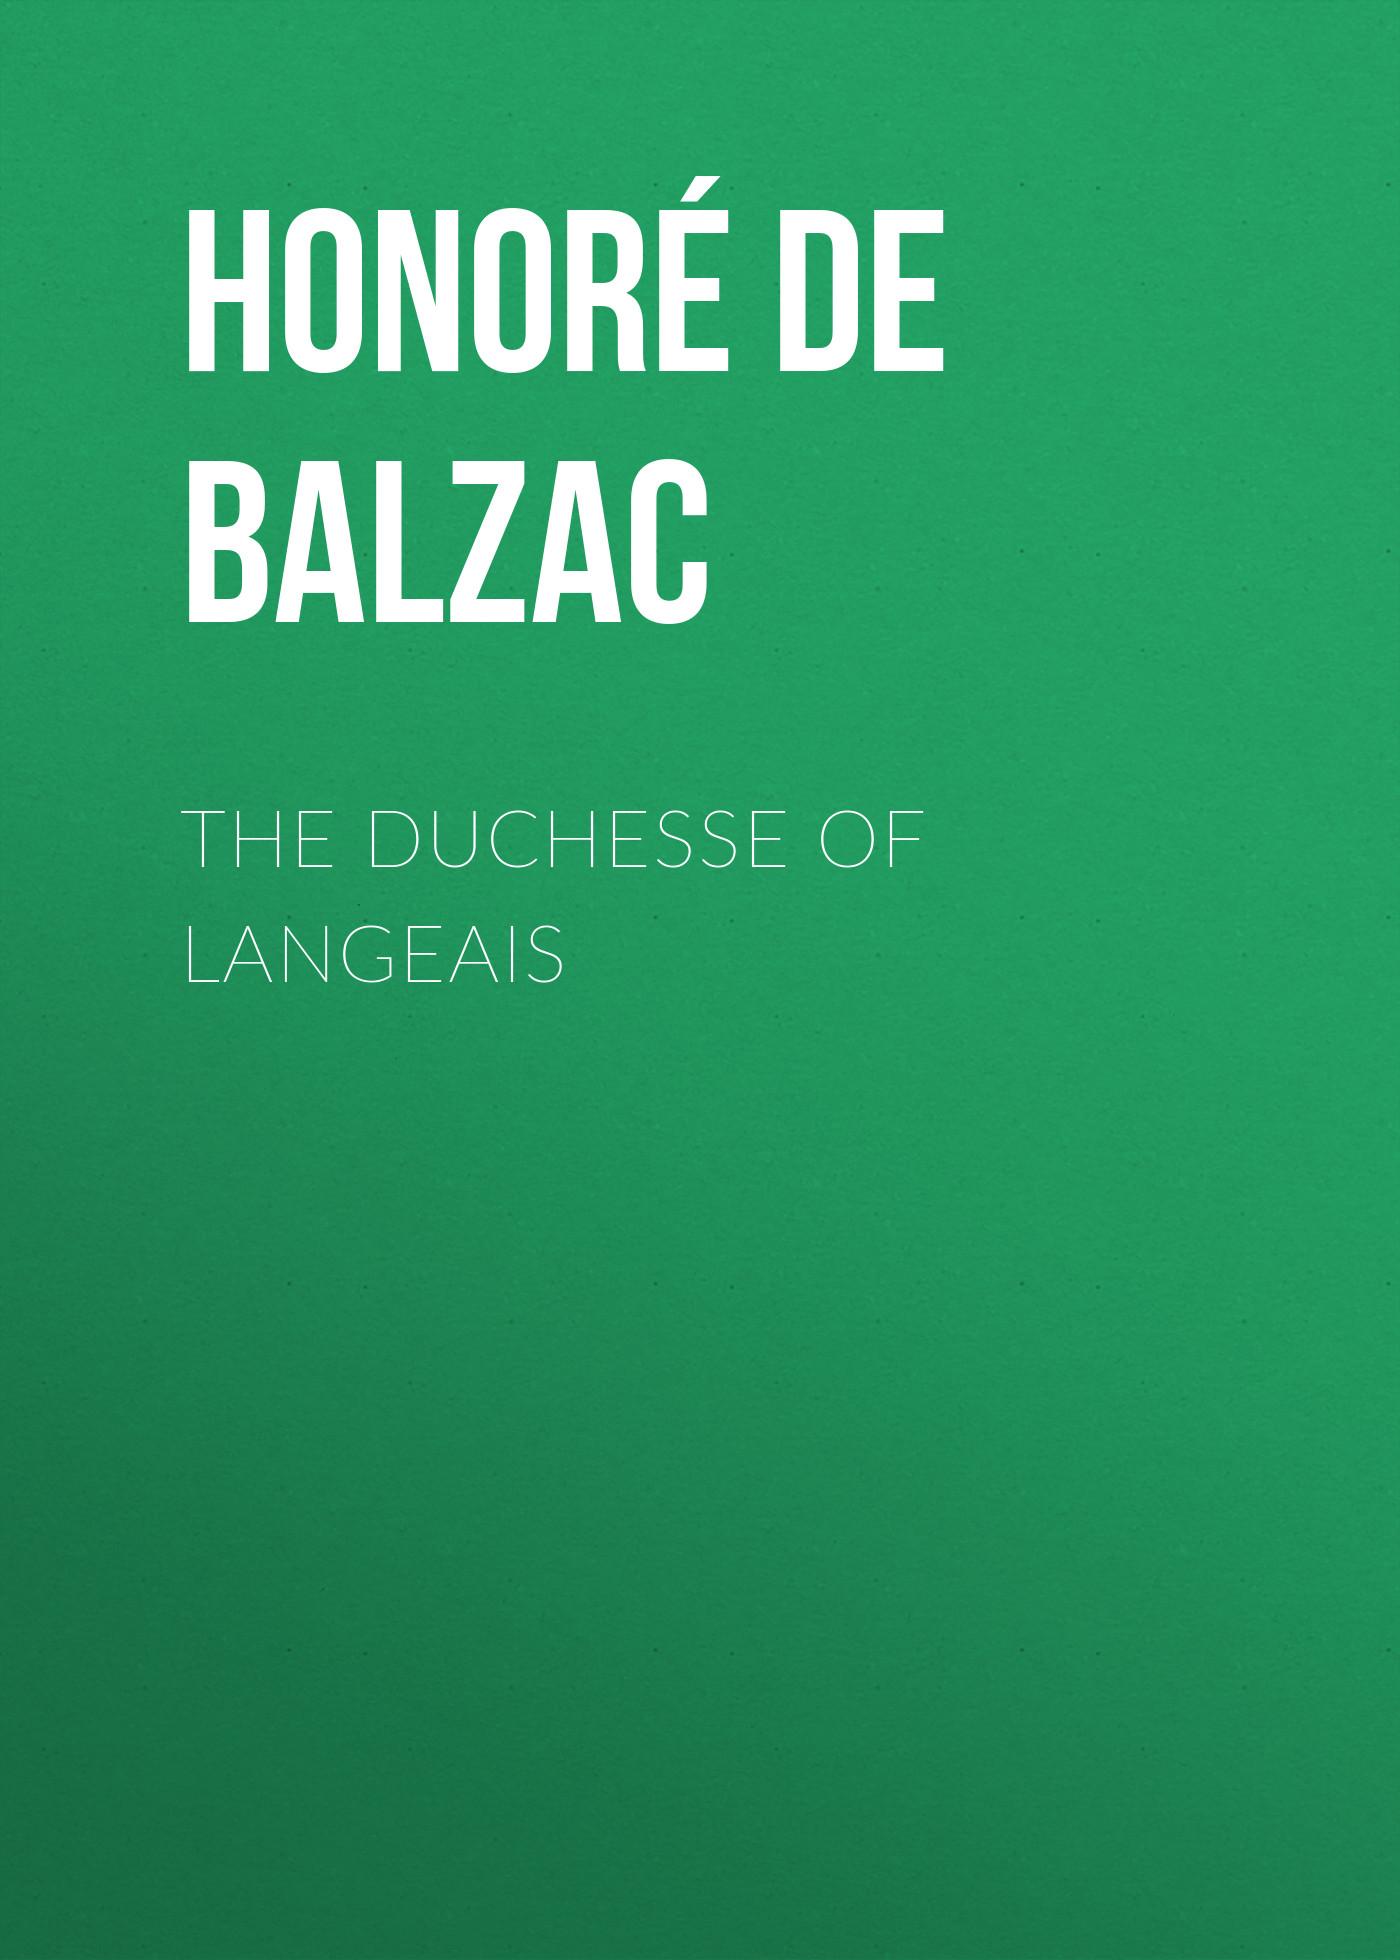 цена на Оноре де Бальзак The Duchesse of Langeais